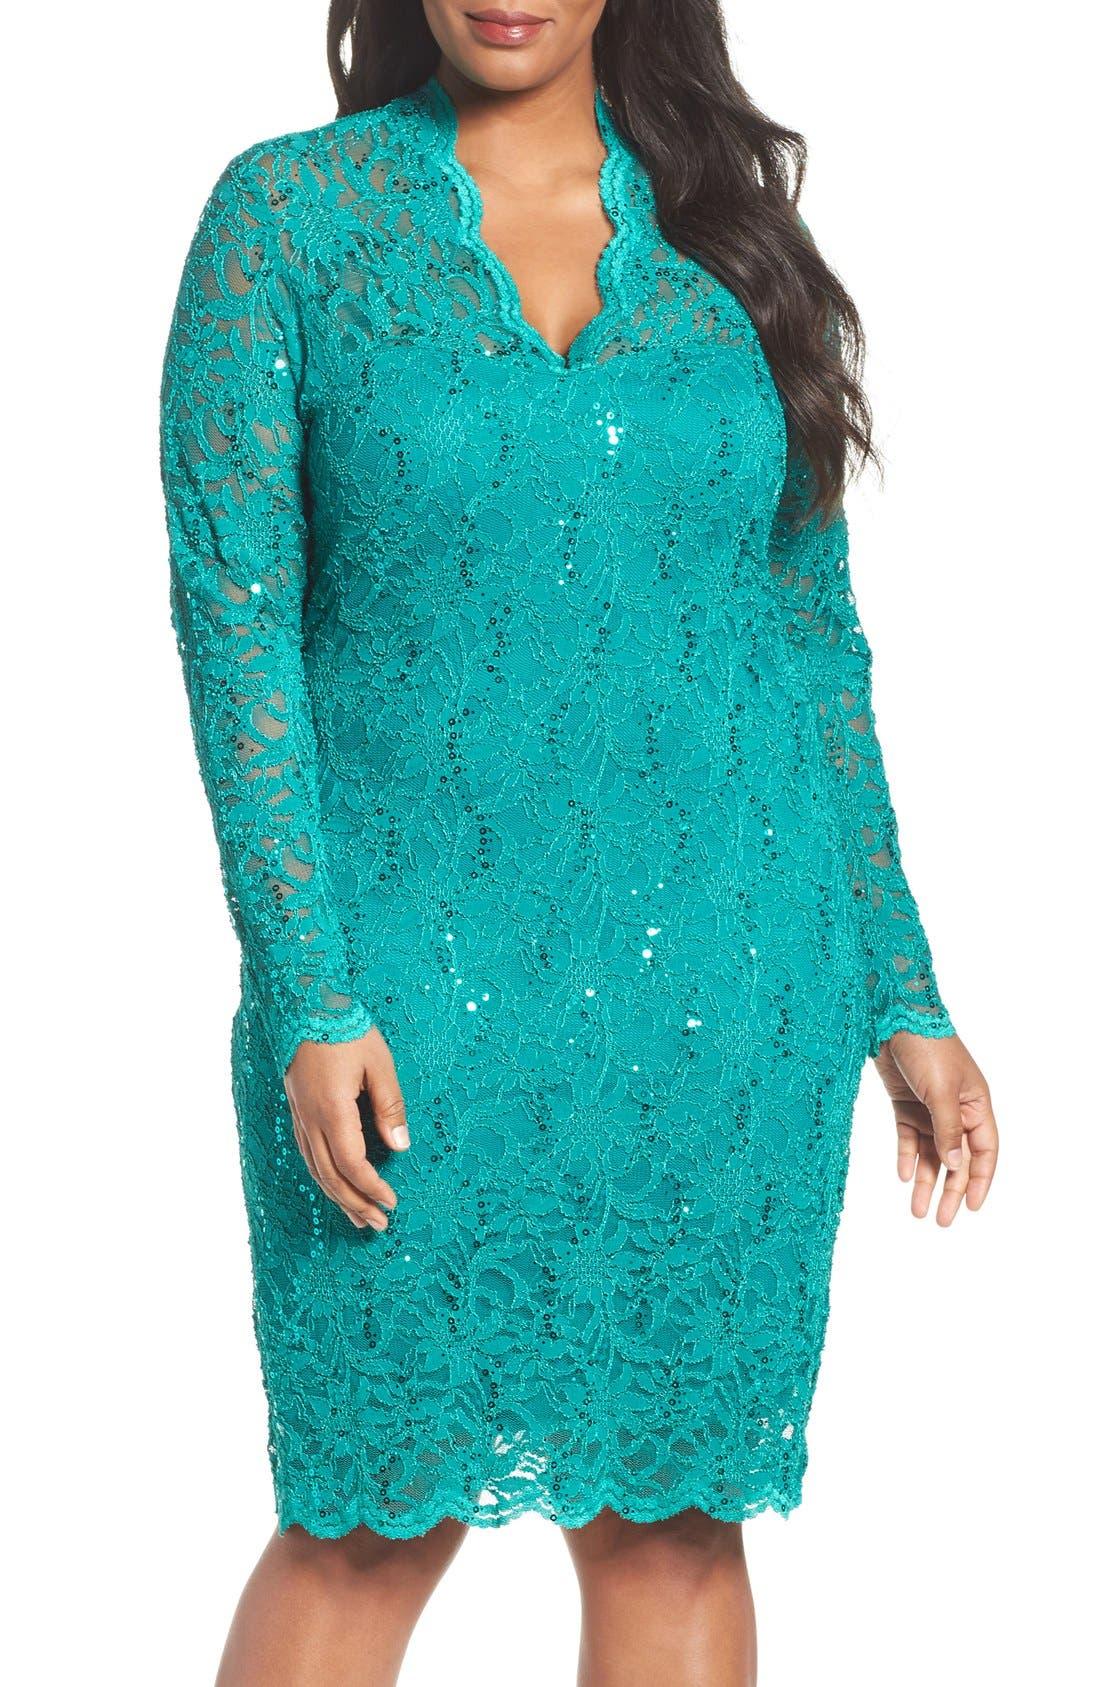 Main Image - Marina Sequin Stretch Lace Sheath Dress (Plus Size)